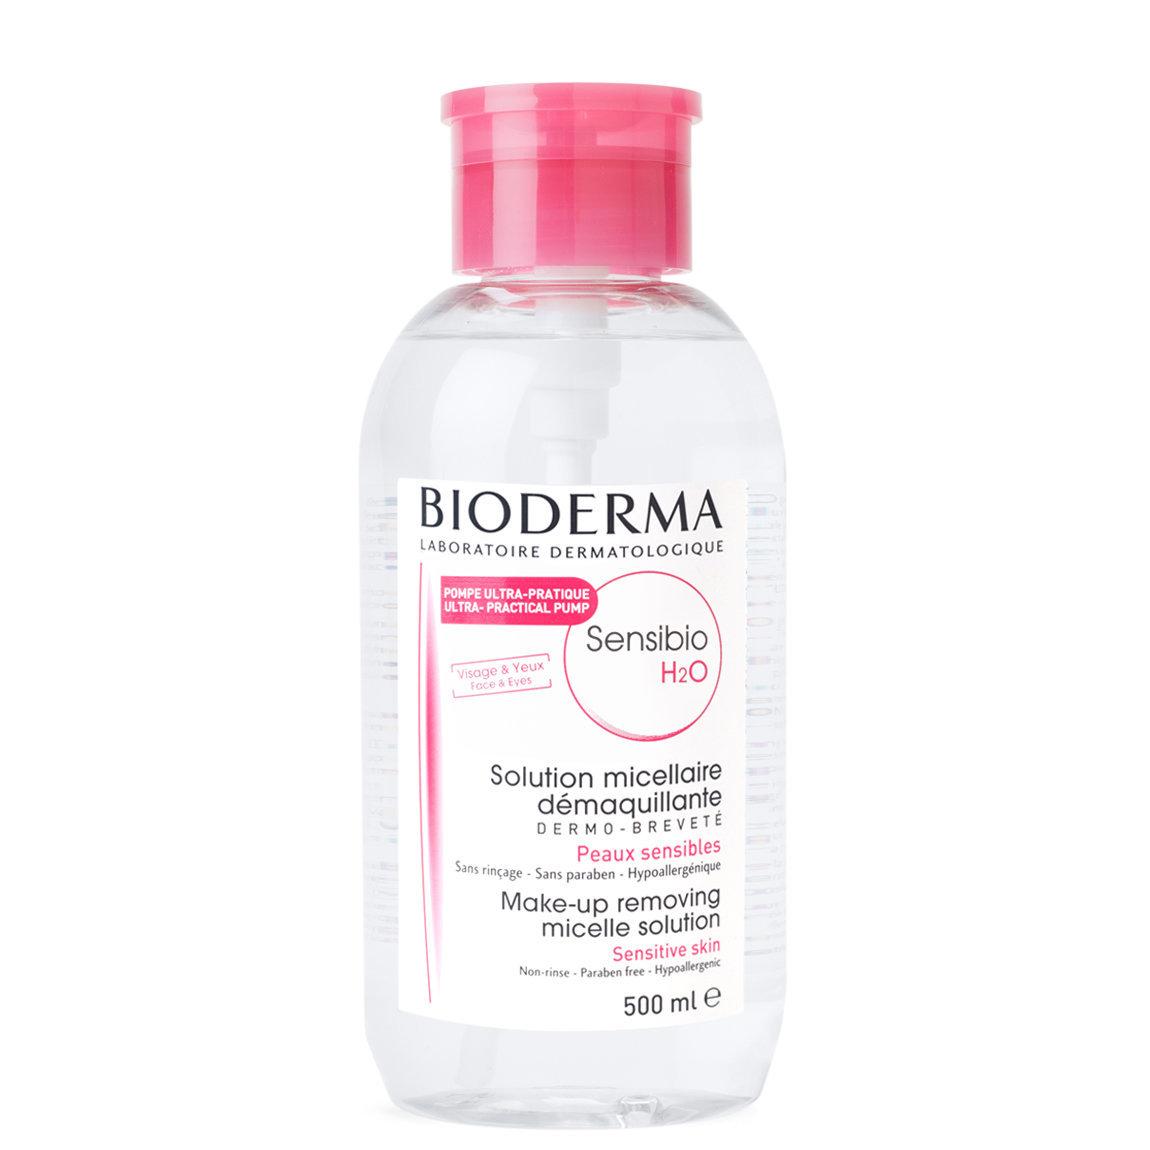 Bioderma Sensibio H2O {Review} - A Deecoded Life